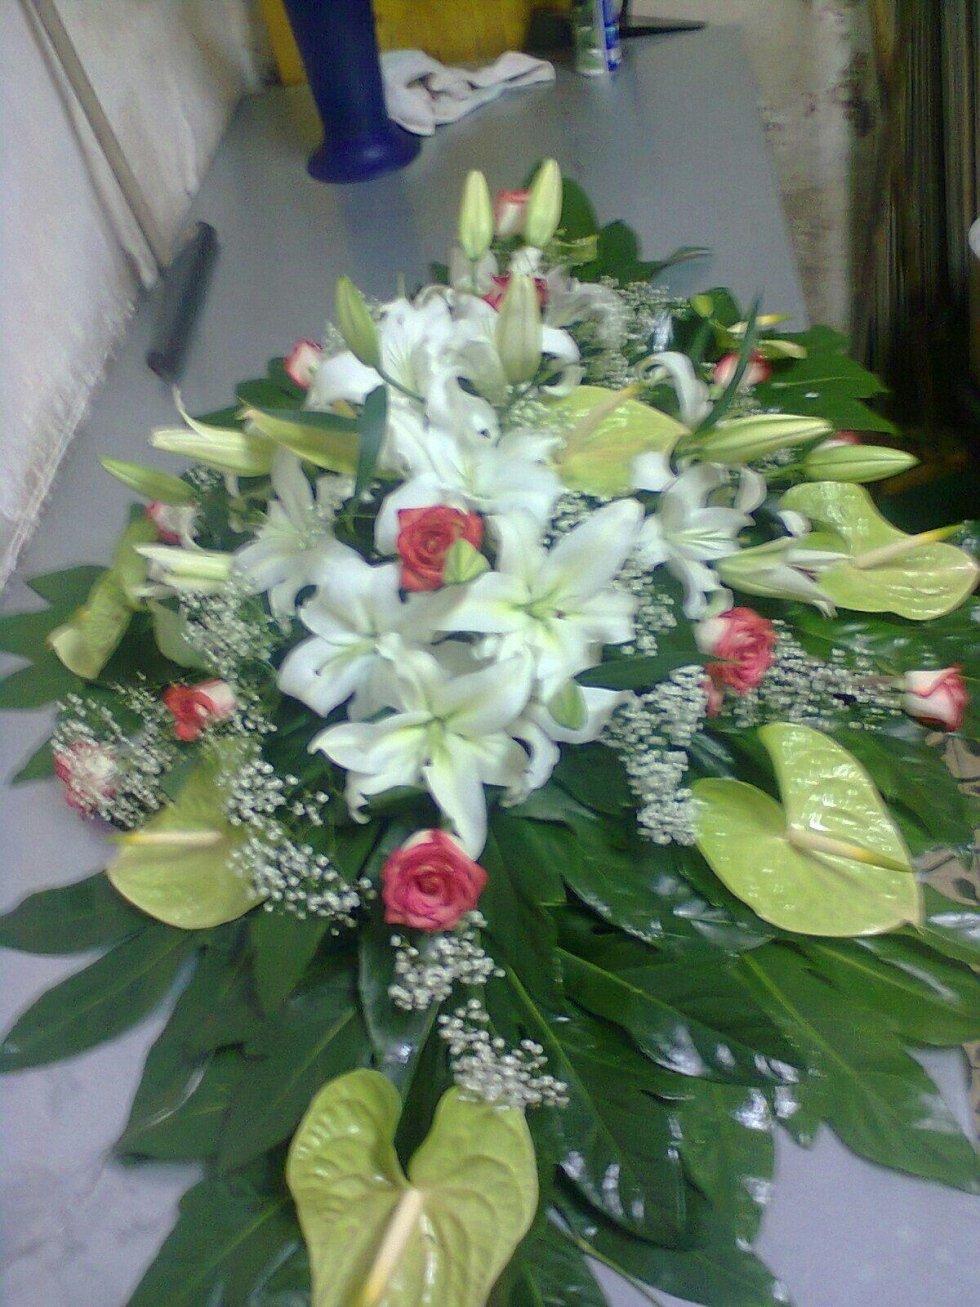 fiori bianchi rose rosa foglie verdi